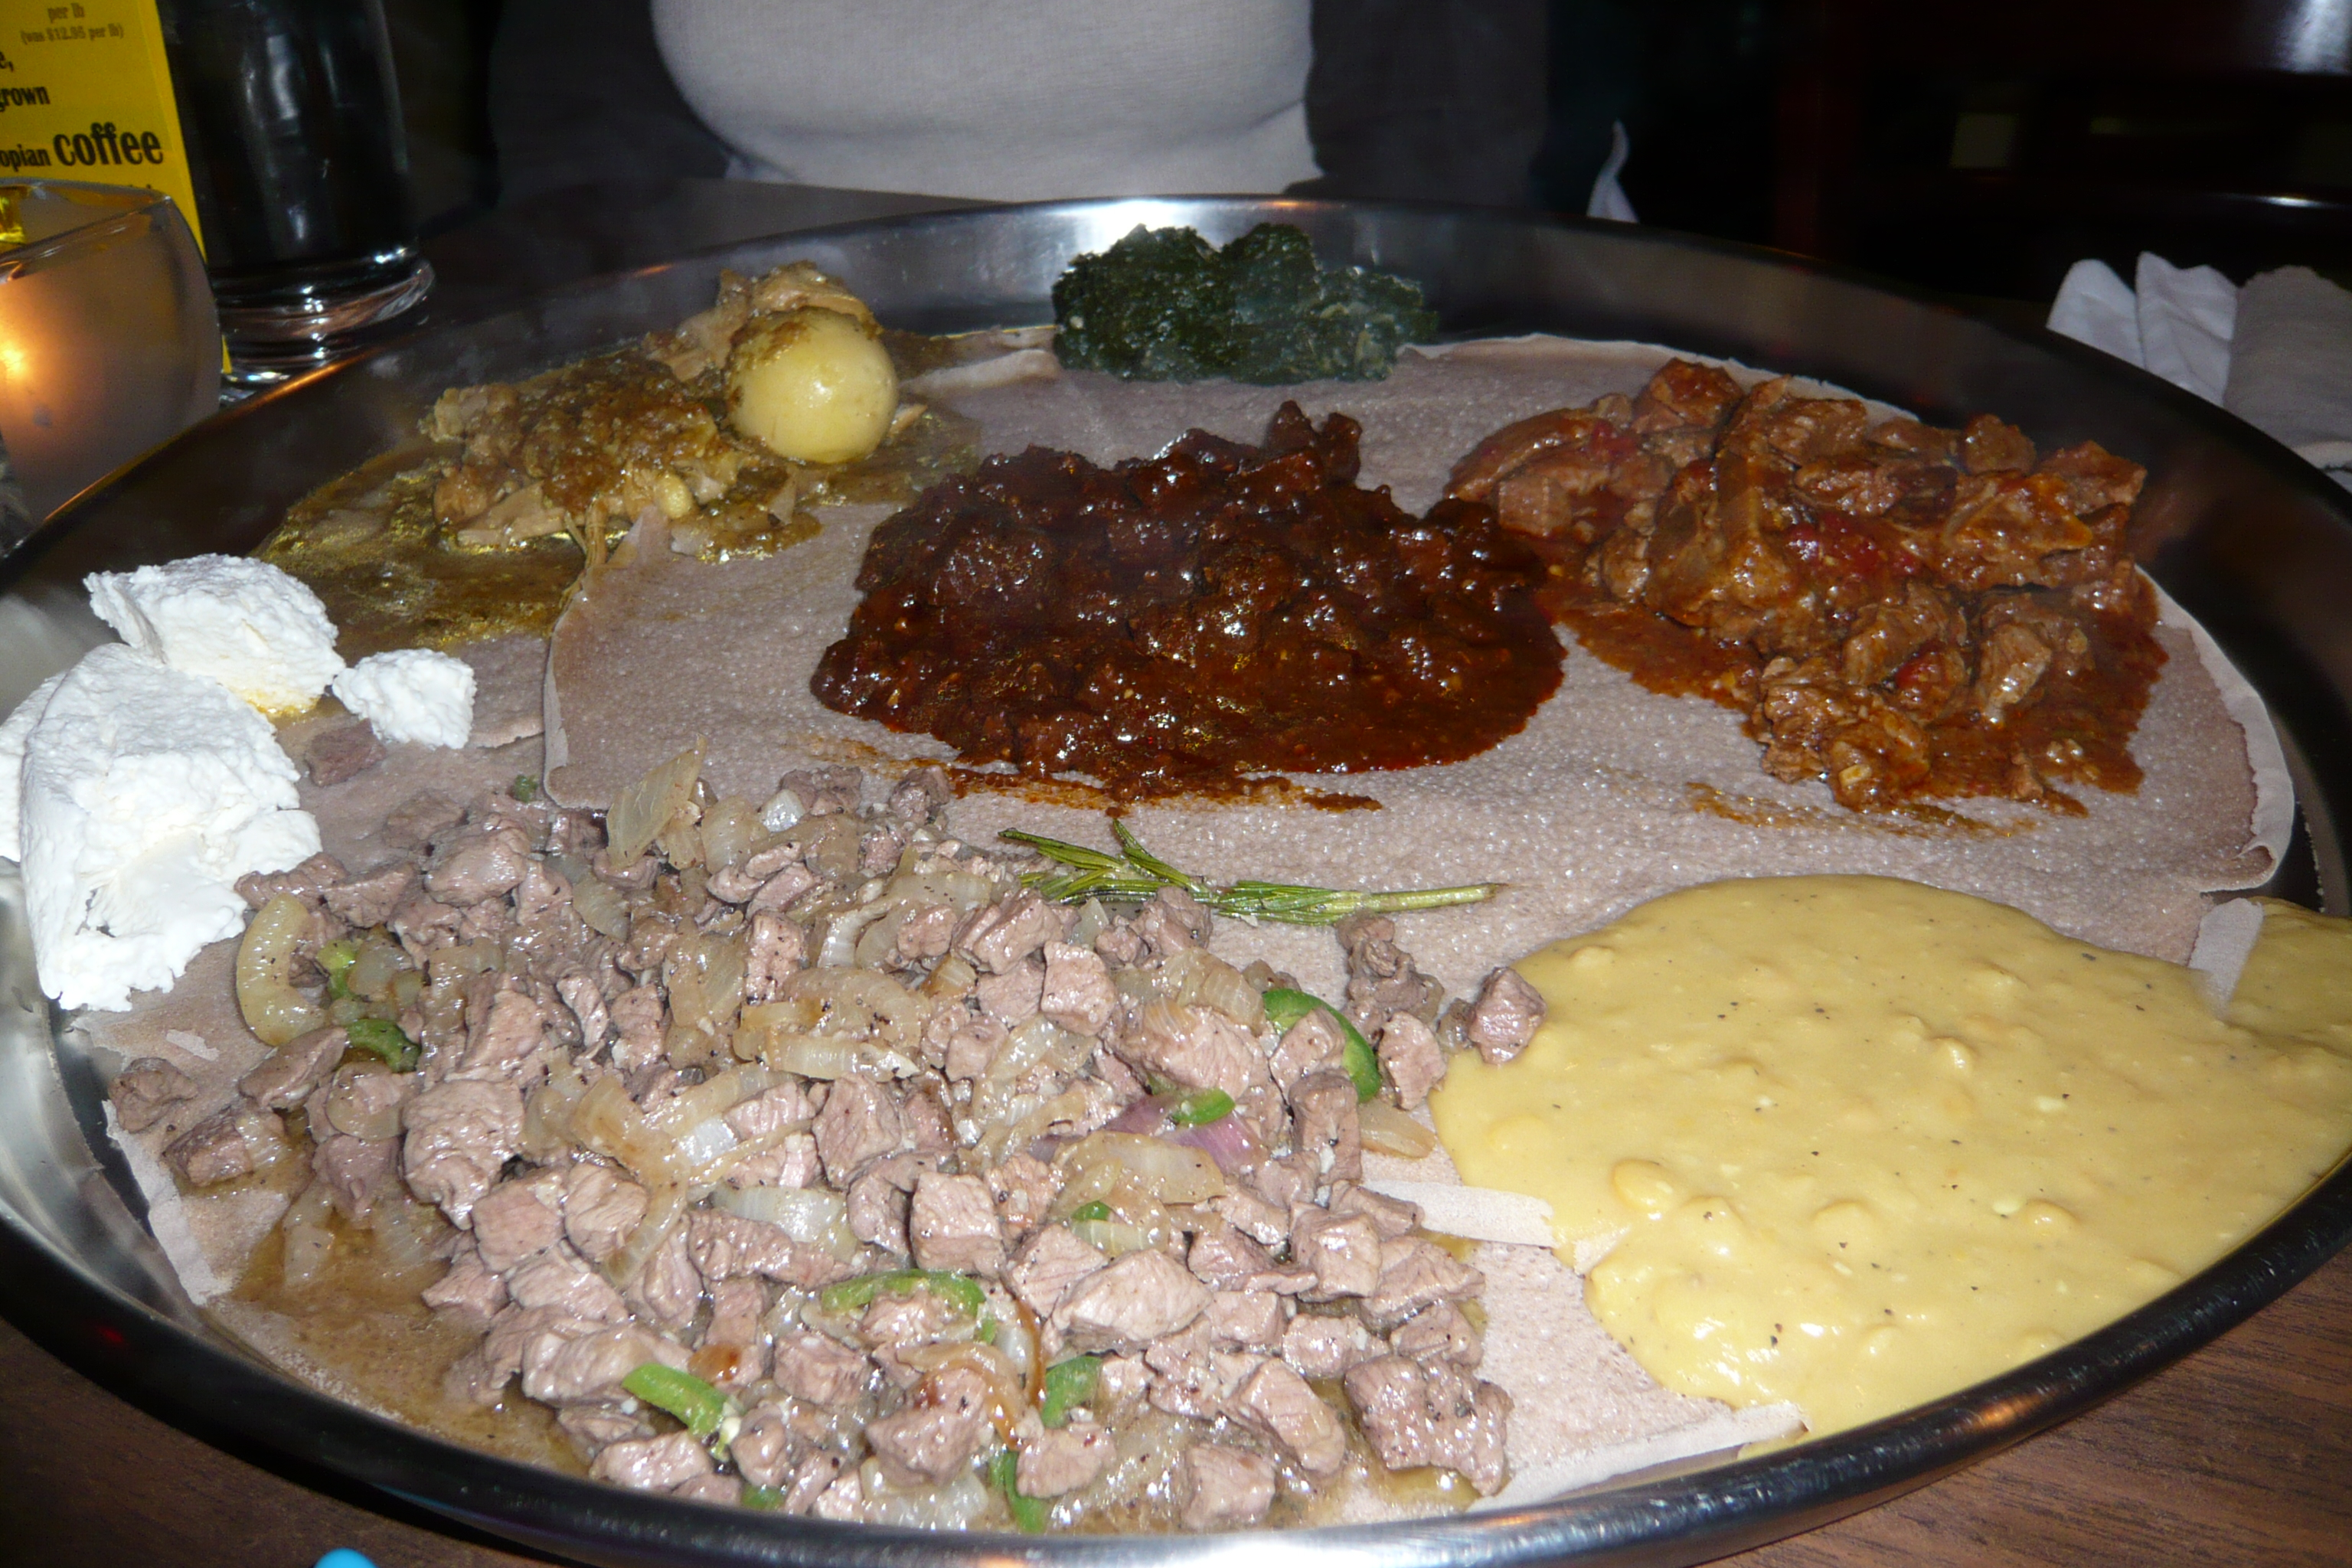 FileEthiopian table setting.jpg & File:Ethiopian table setting.jpg - Wikimedia Commons